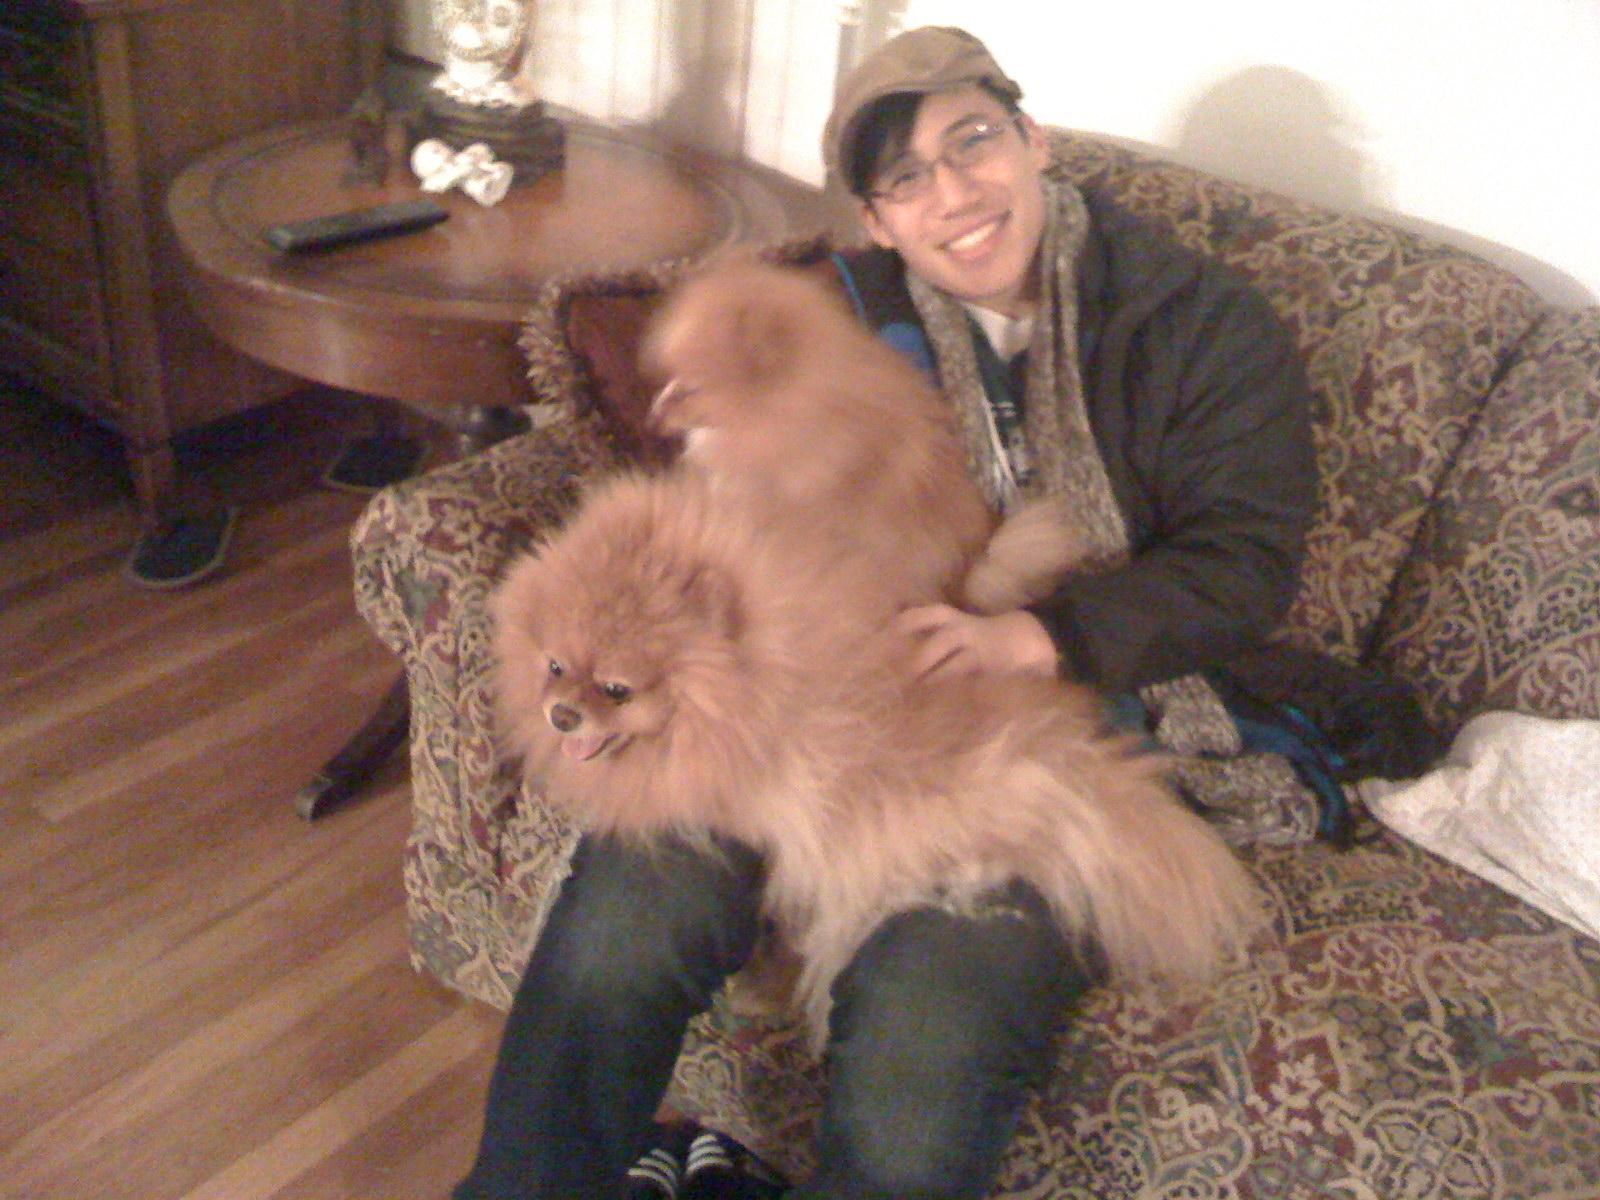 I love those puppies.